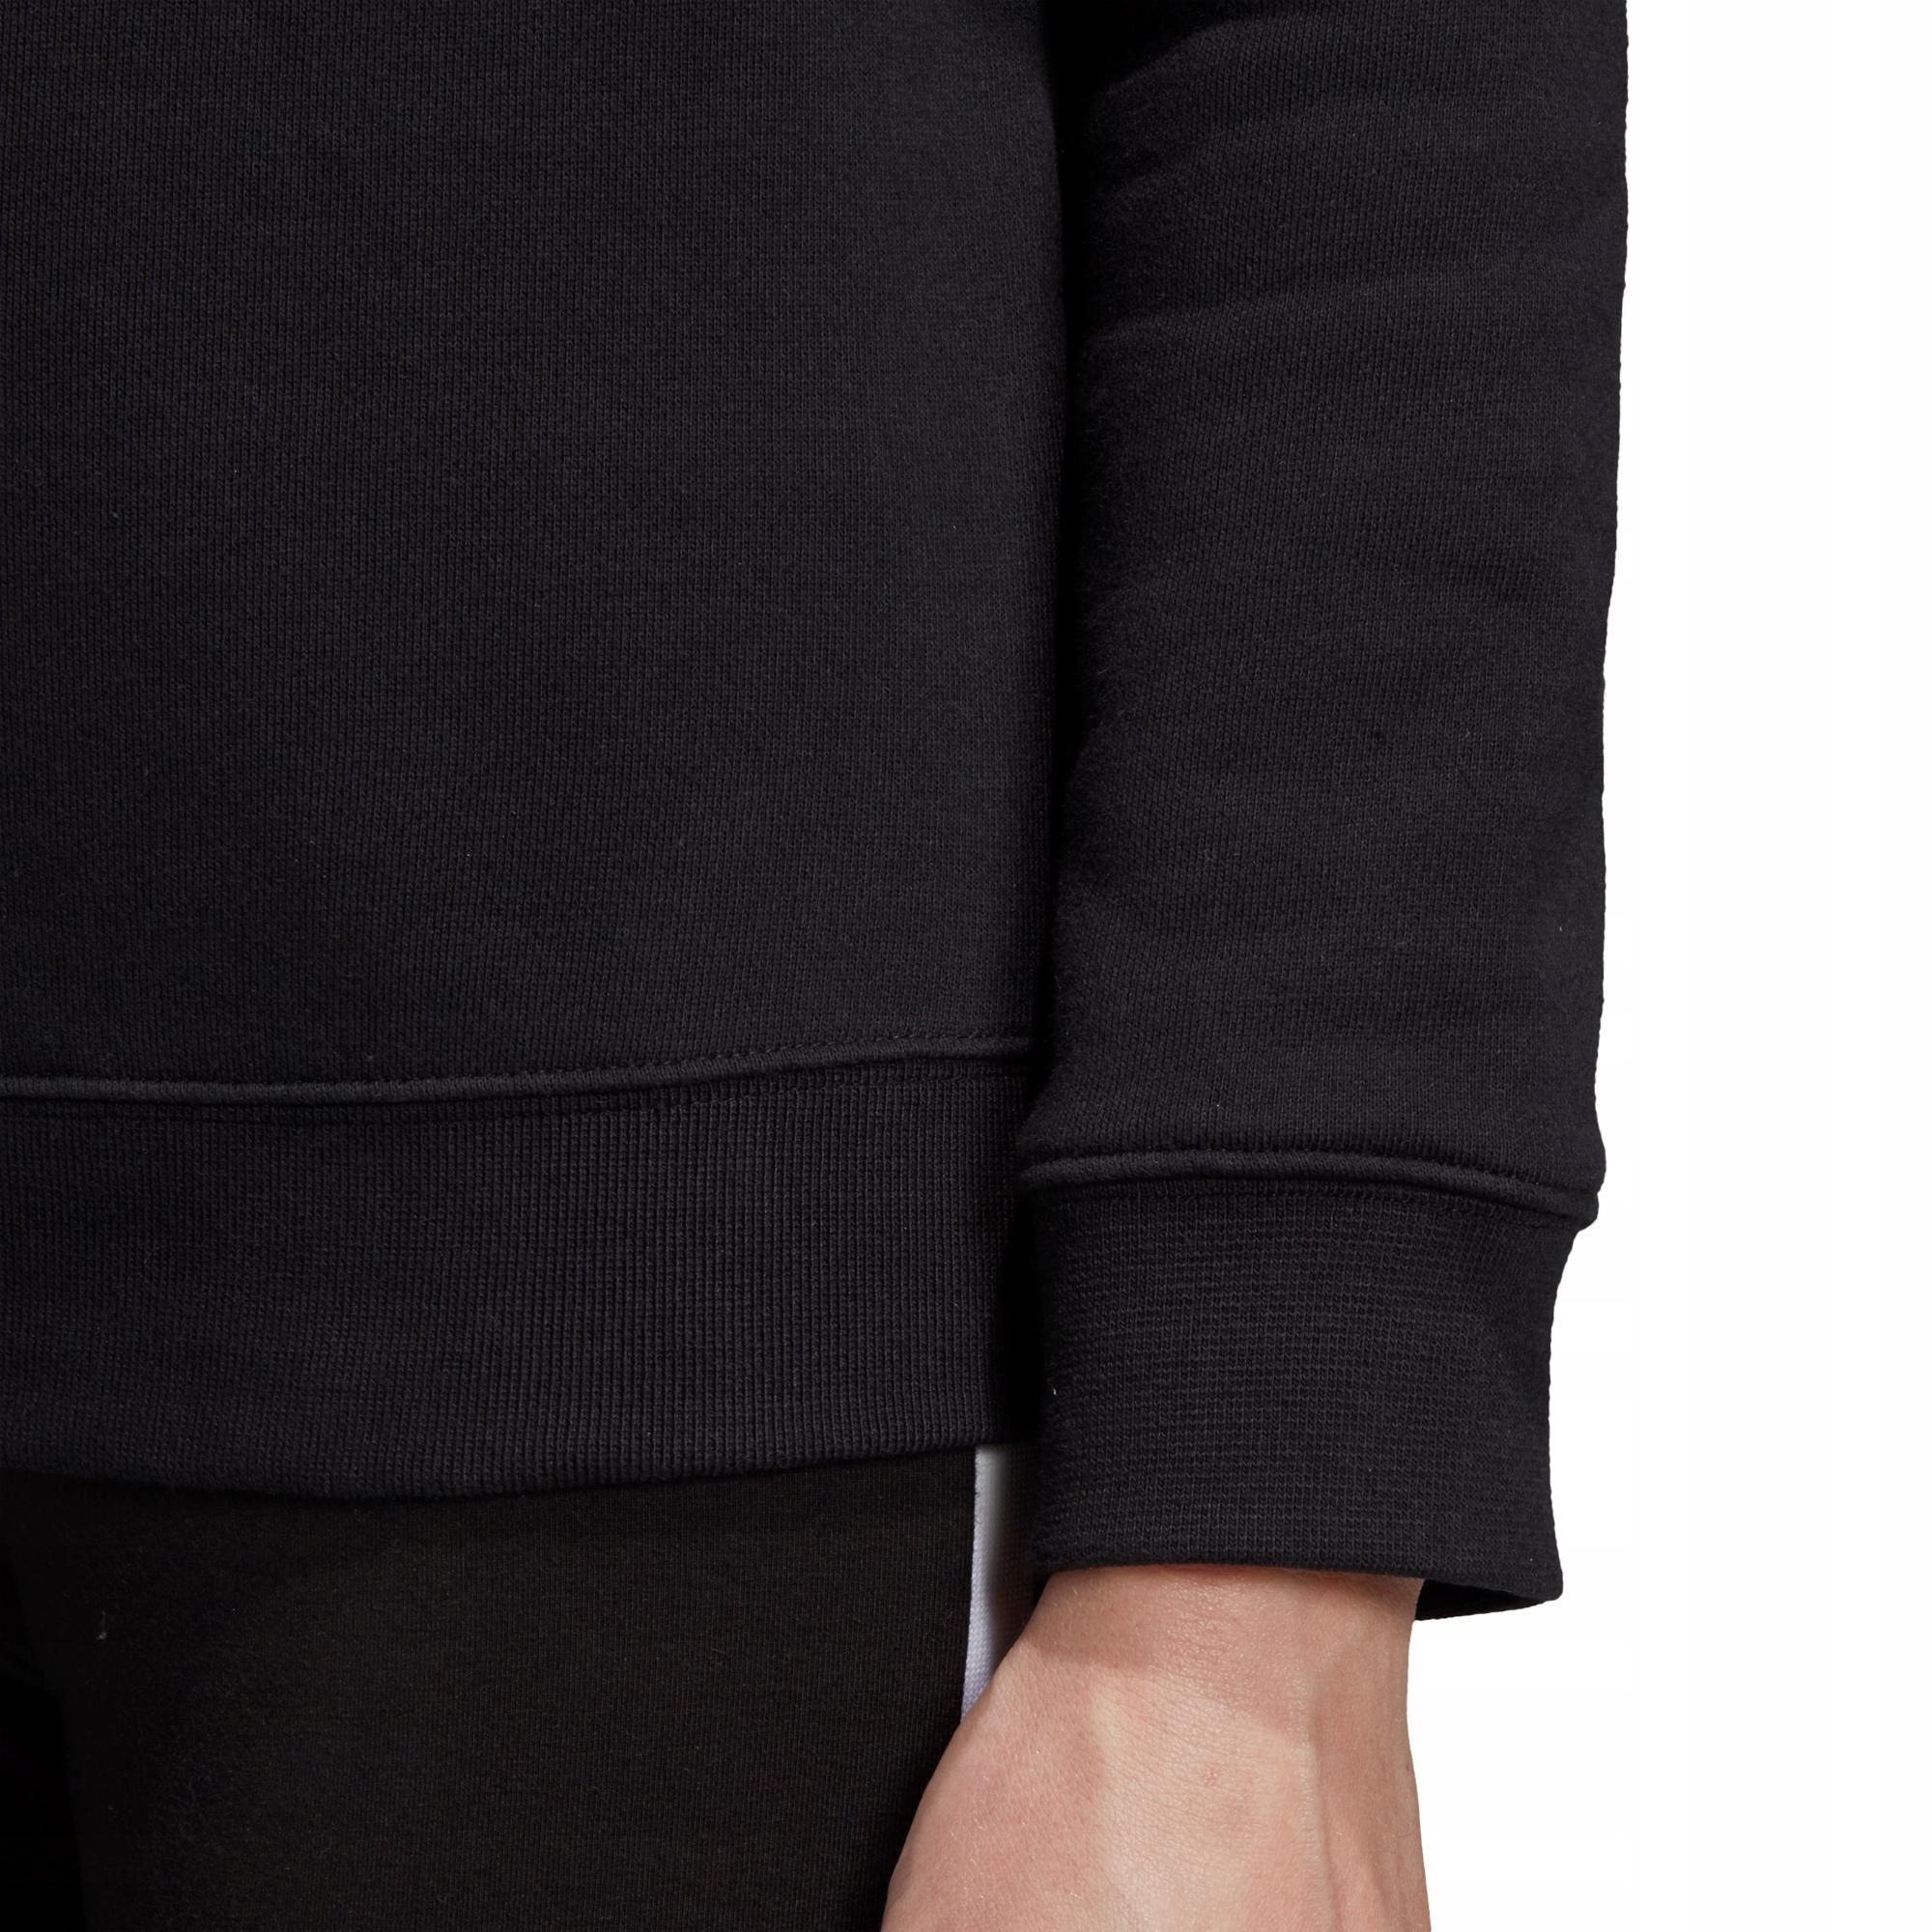 Bluza adidas Trefoil DV2612 34